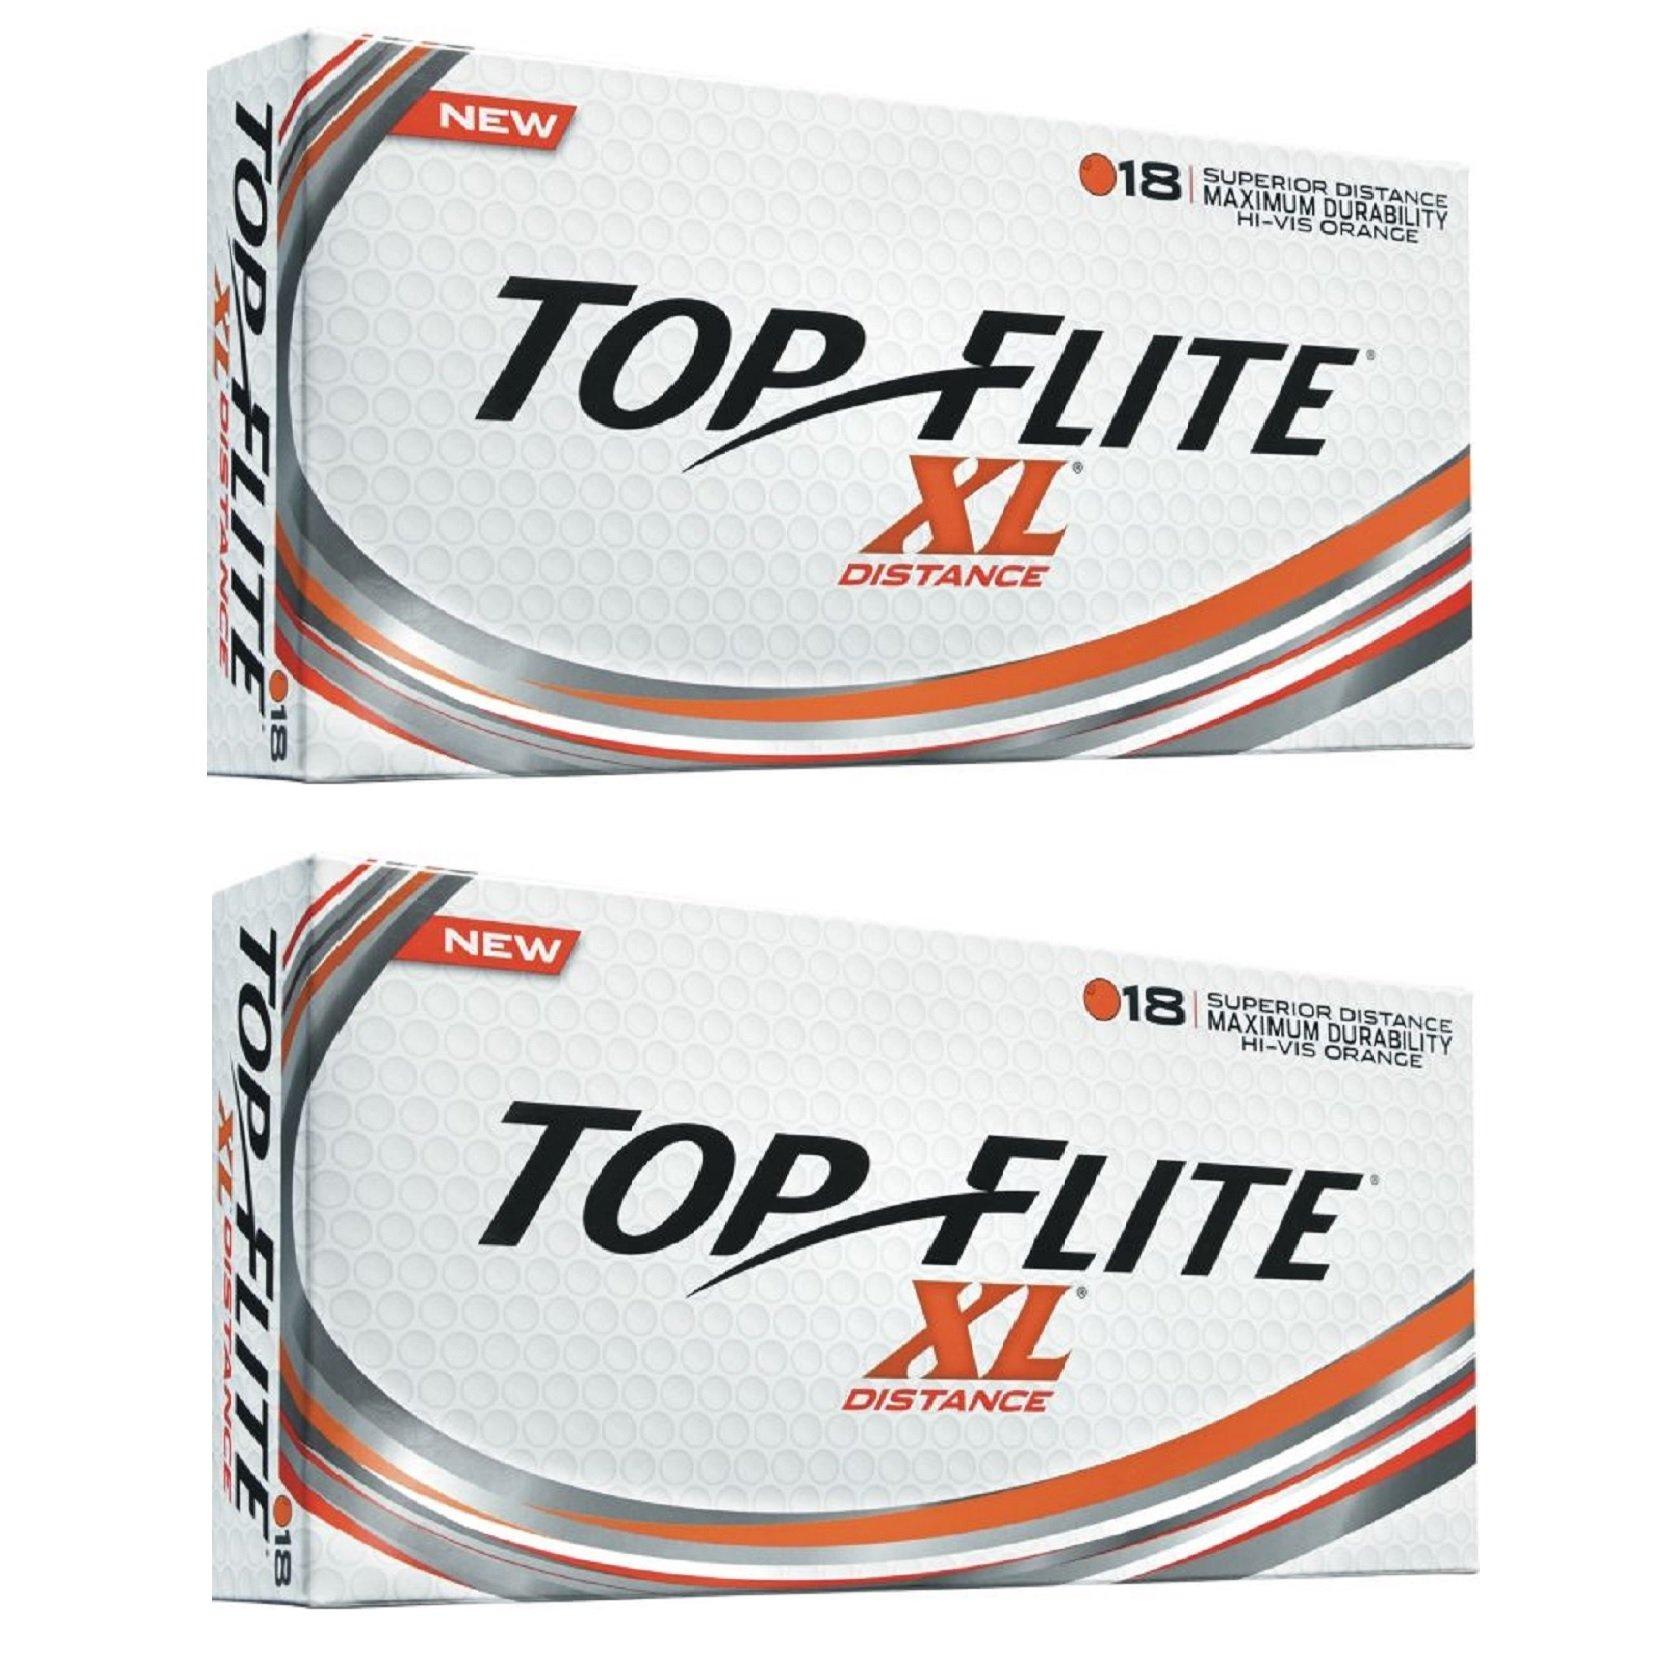 2pk Top Flite XL Distance Golf Balls - Orange - 36 Balls by Top Flight (Image #1)